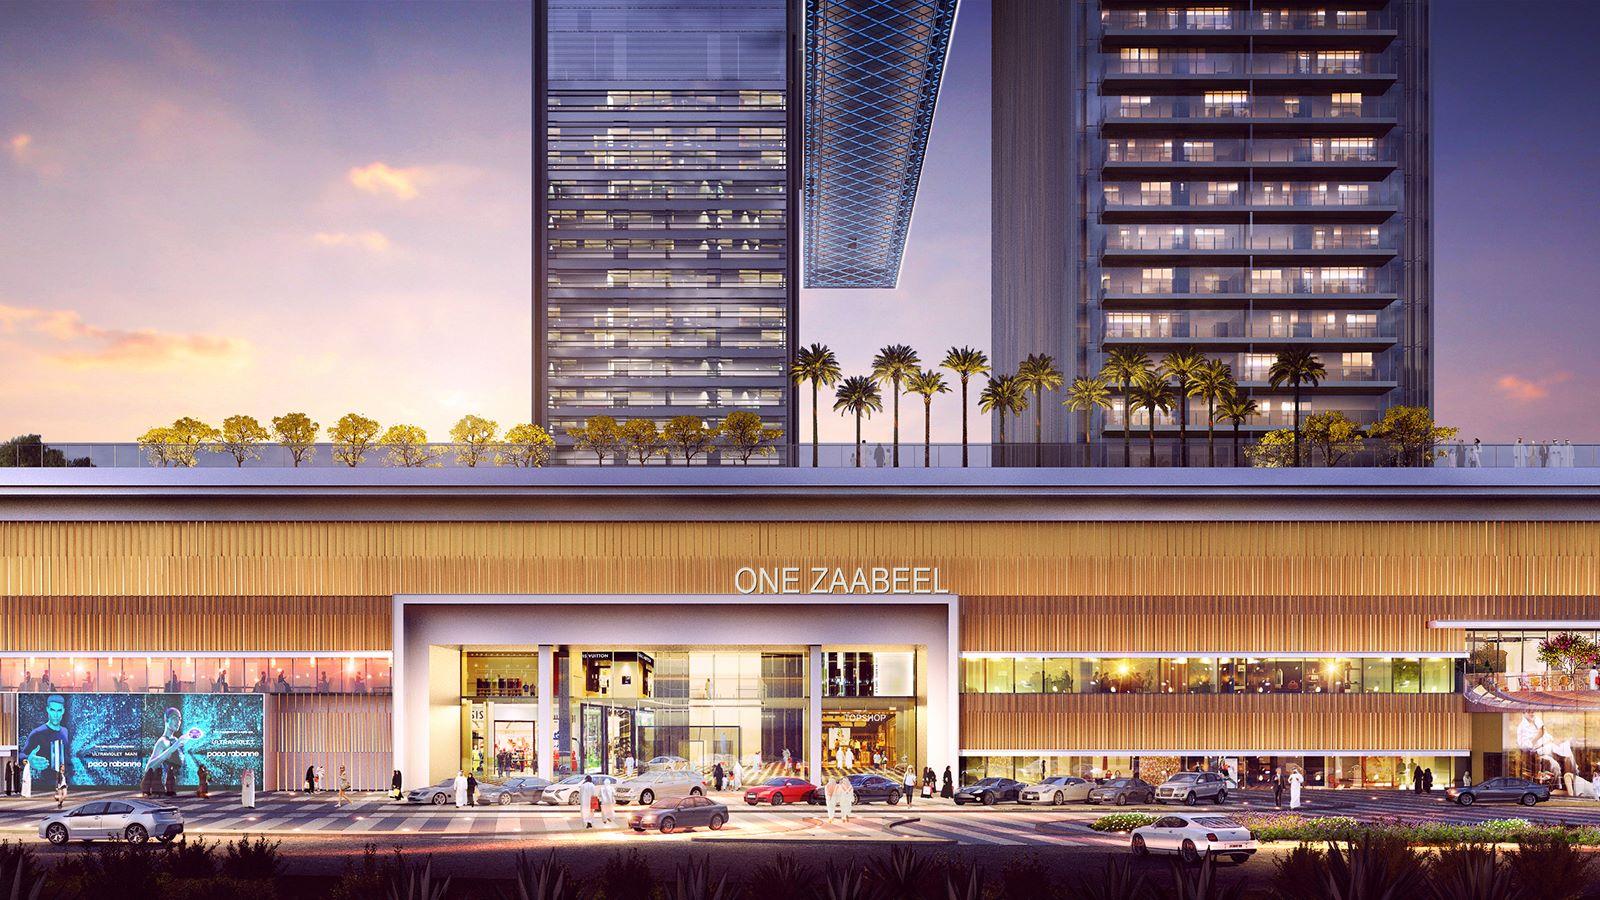 CGI View of One Zaabeel Building - Mace Group